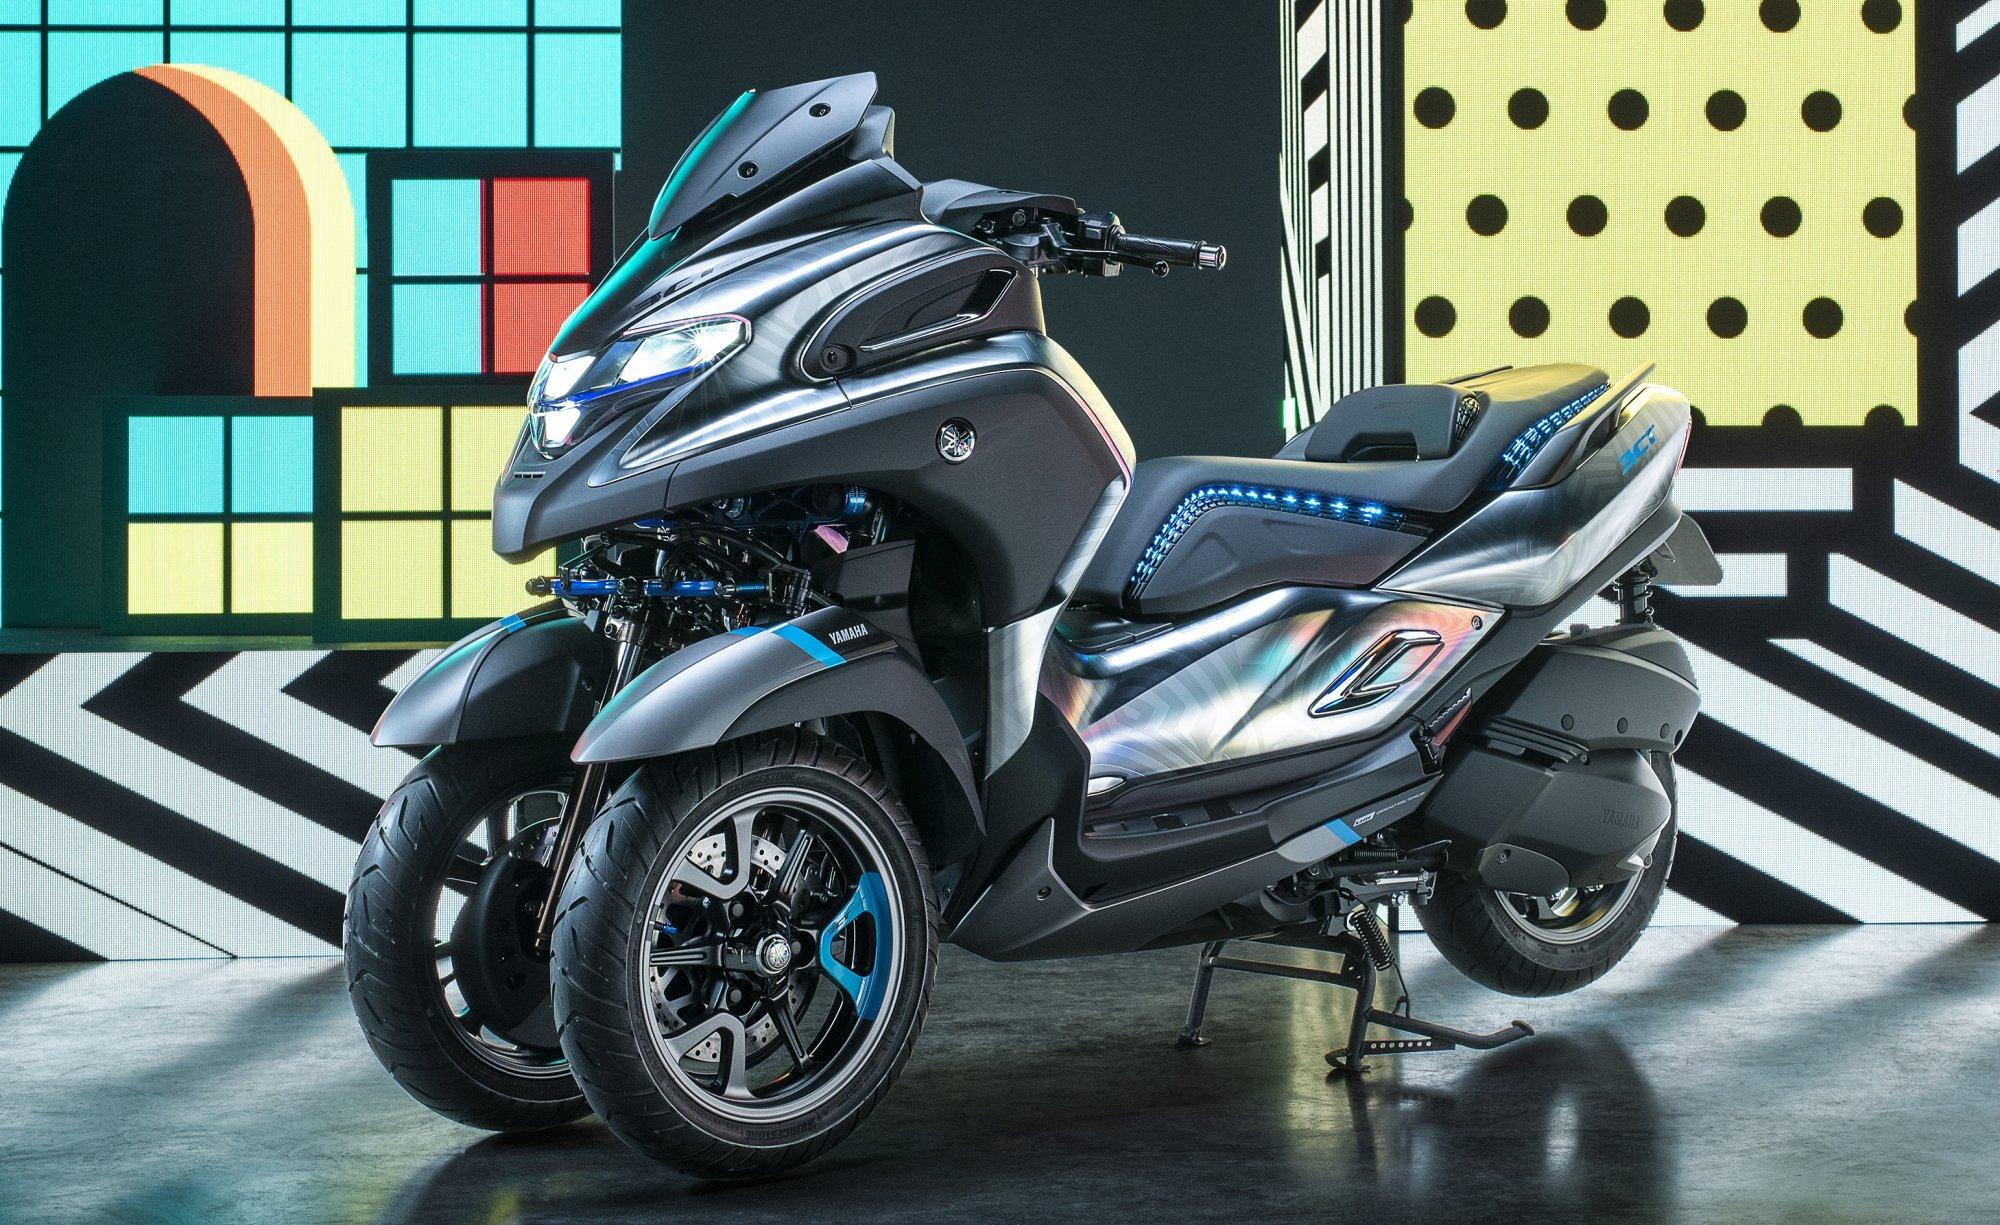 042419-Yamaha-3CT-concept-1.jpg